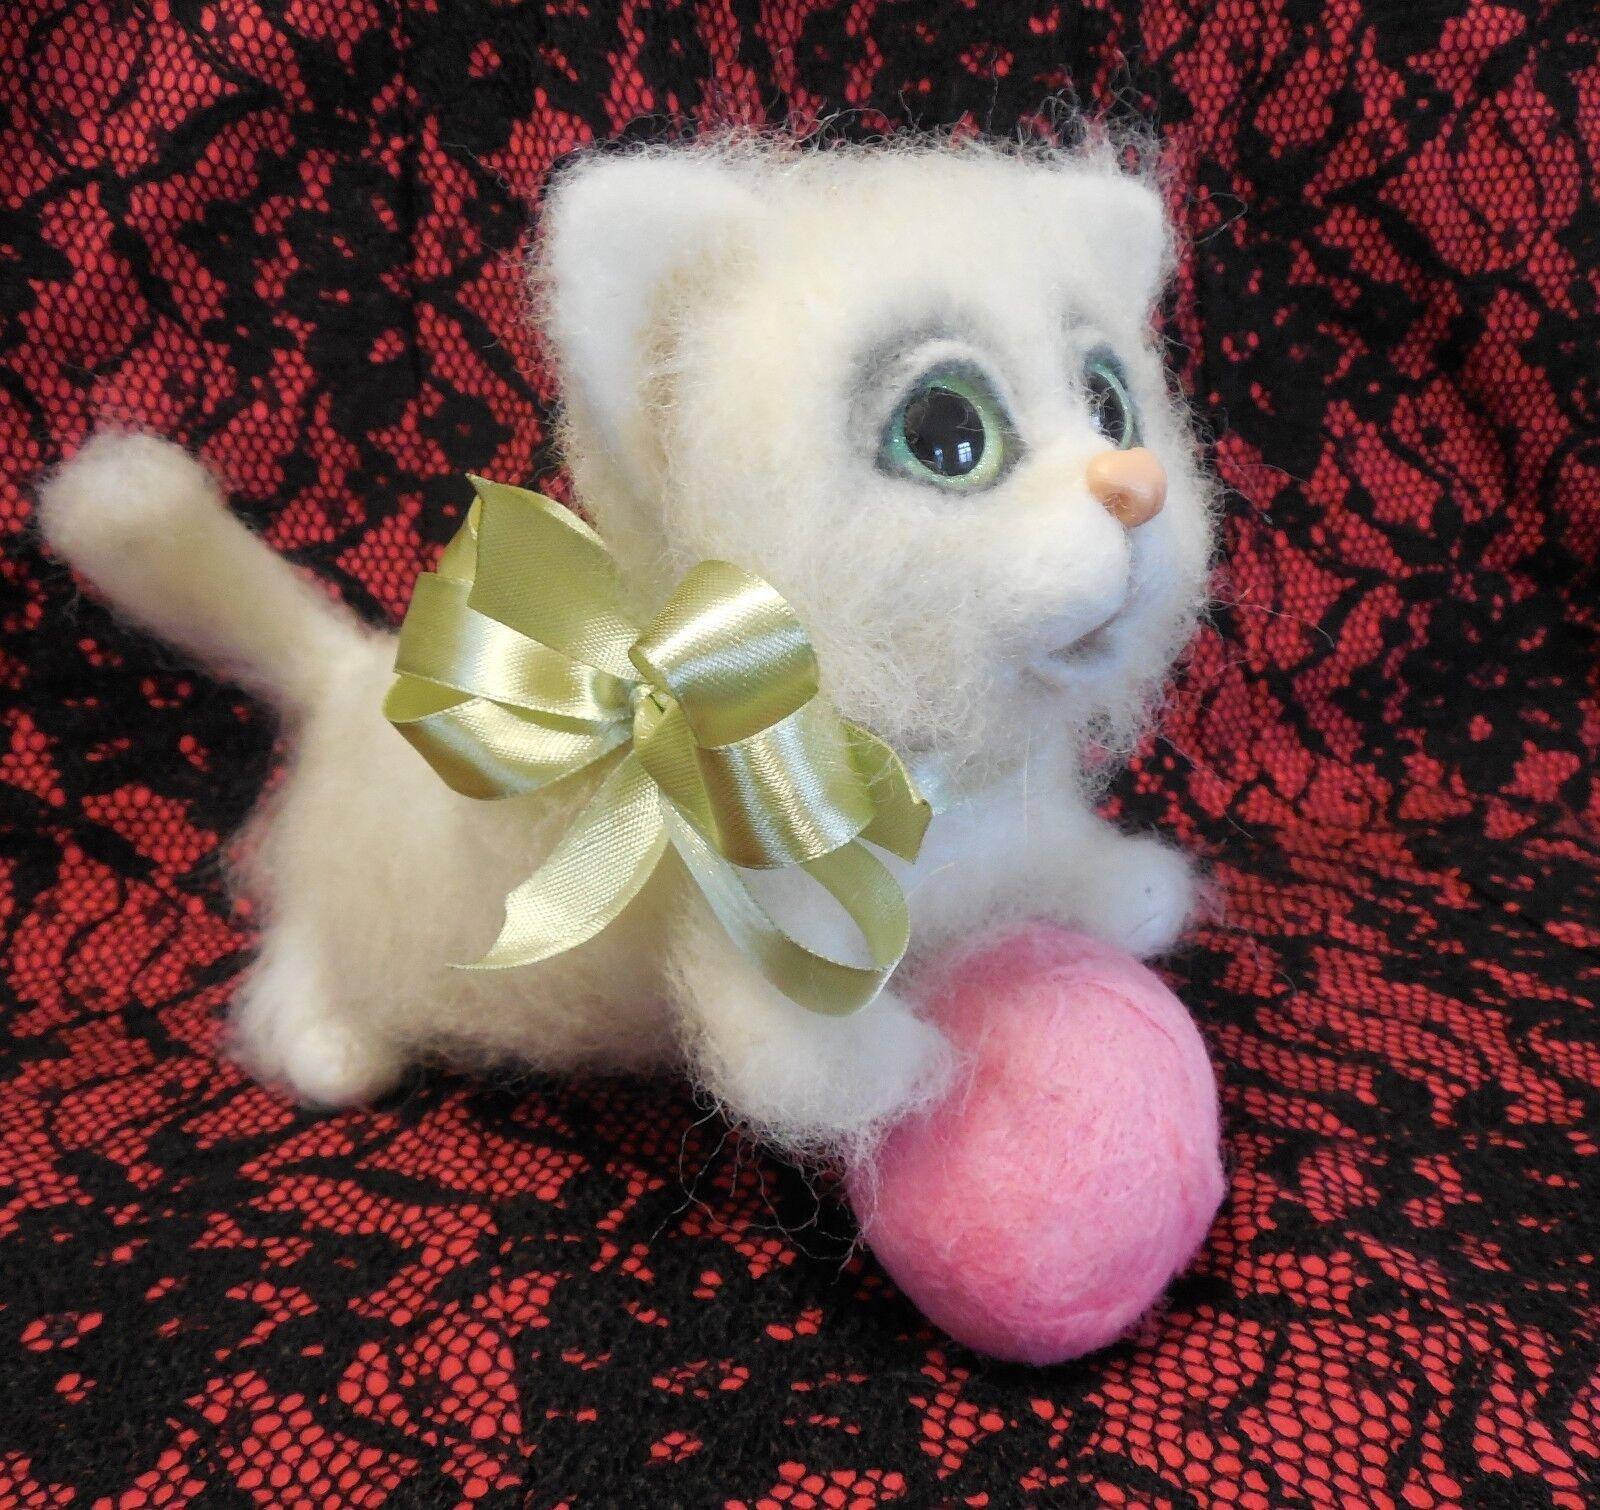 Handmade OOAK  Pysanky Pysanka Needle Felted Gift Merino Wool Cat Egg